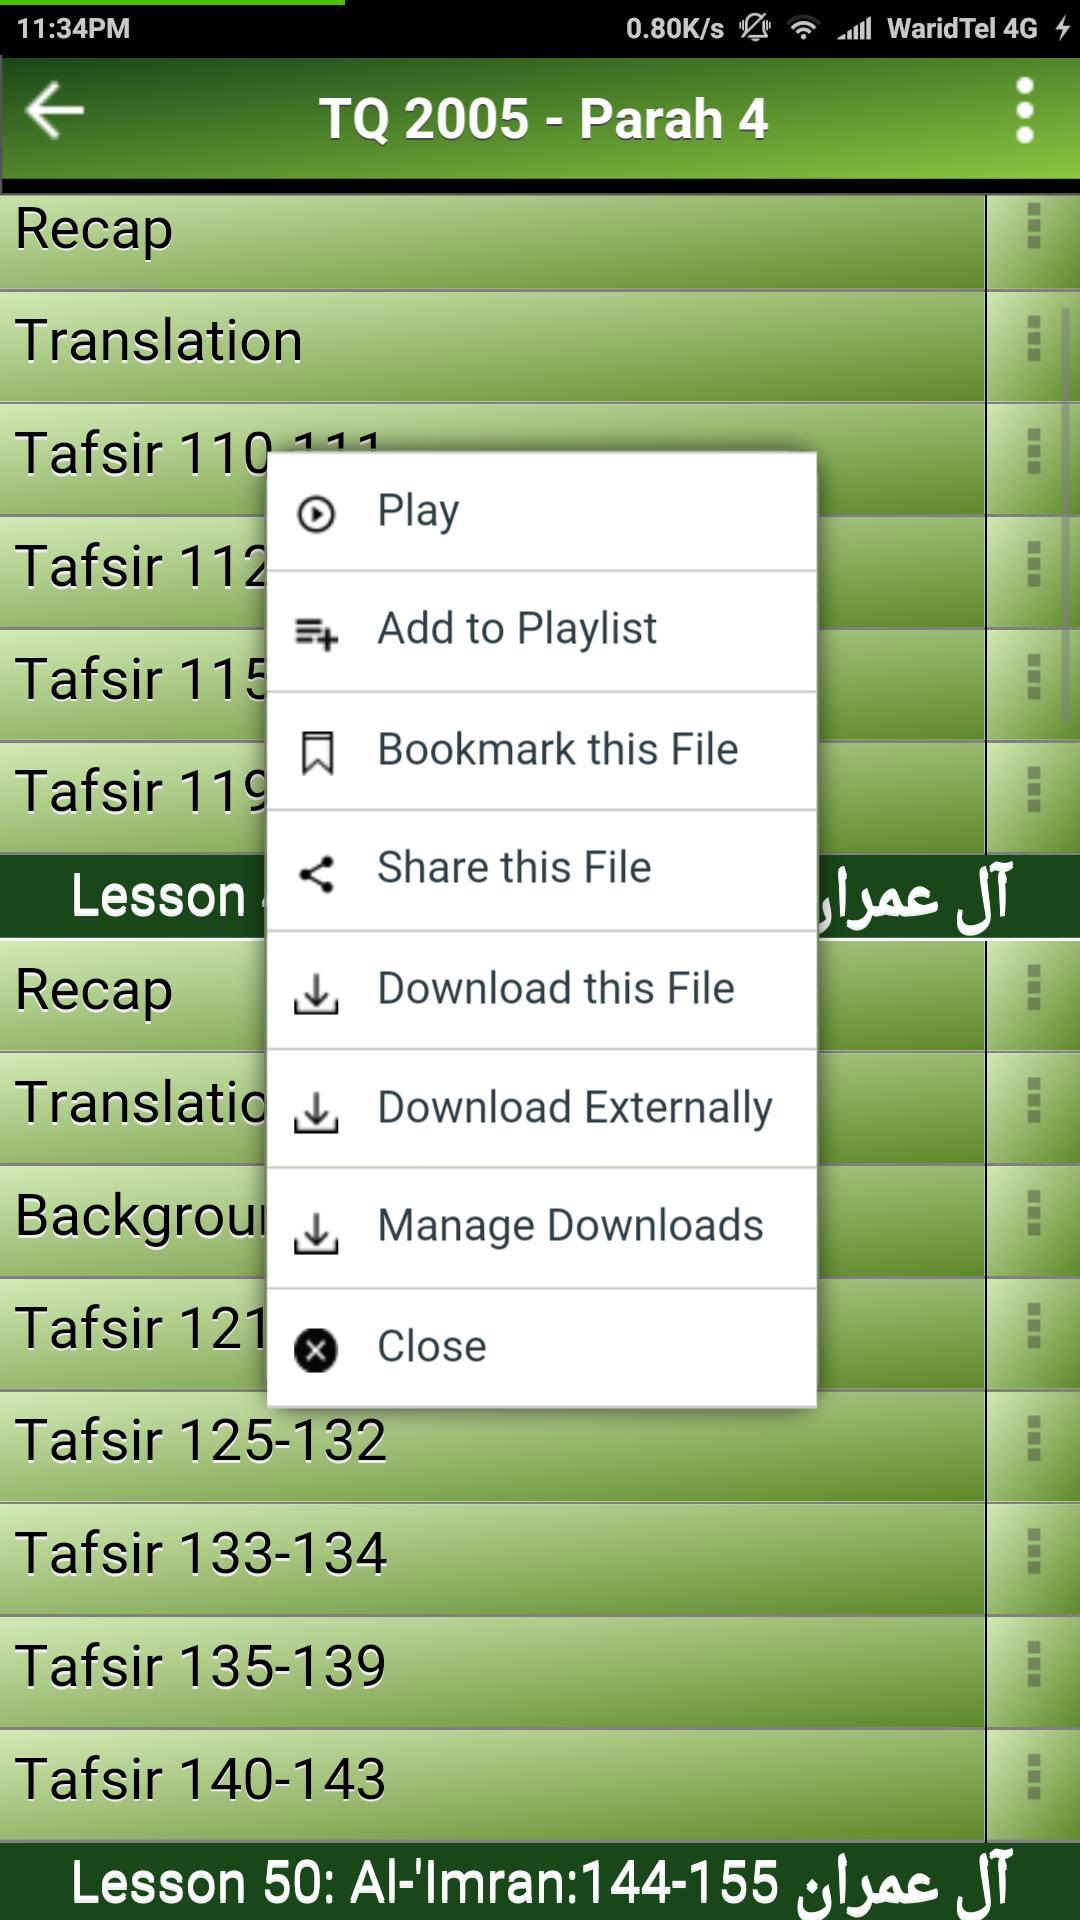 Quran for All (Al-Huda Int ) for Android - APK Download